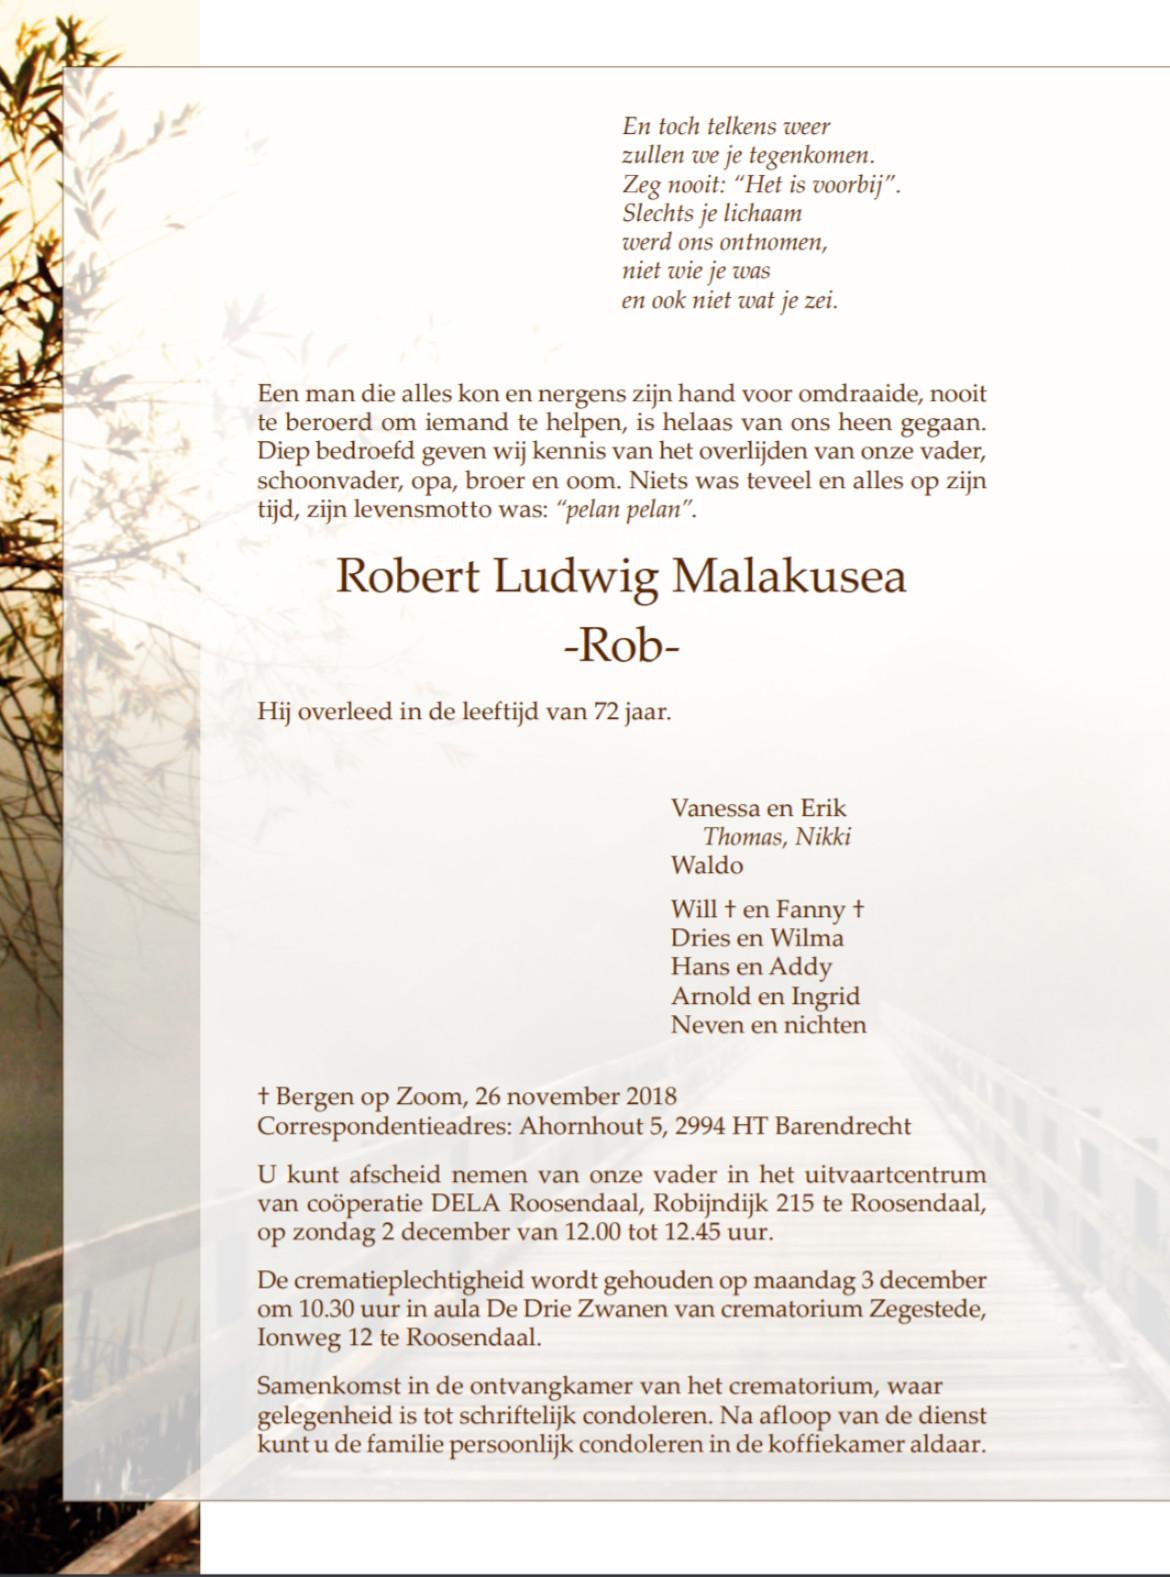 rouwkaart Rob Malakusea